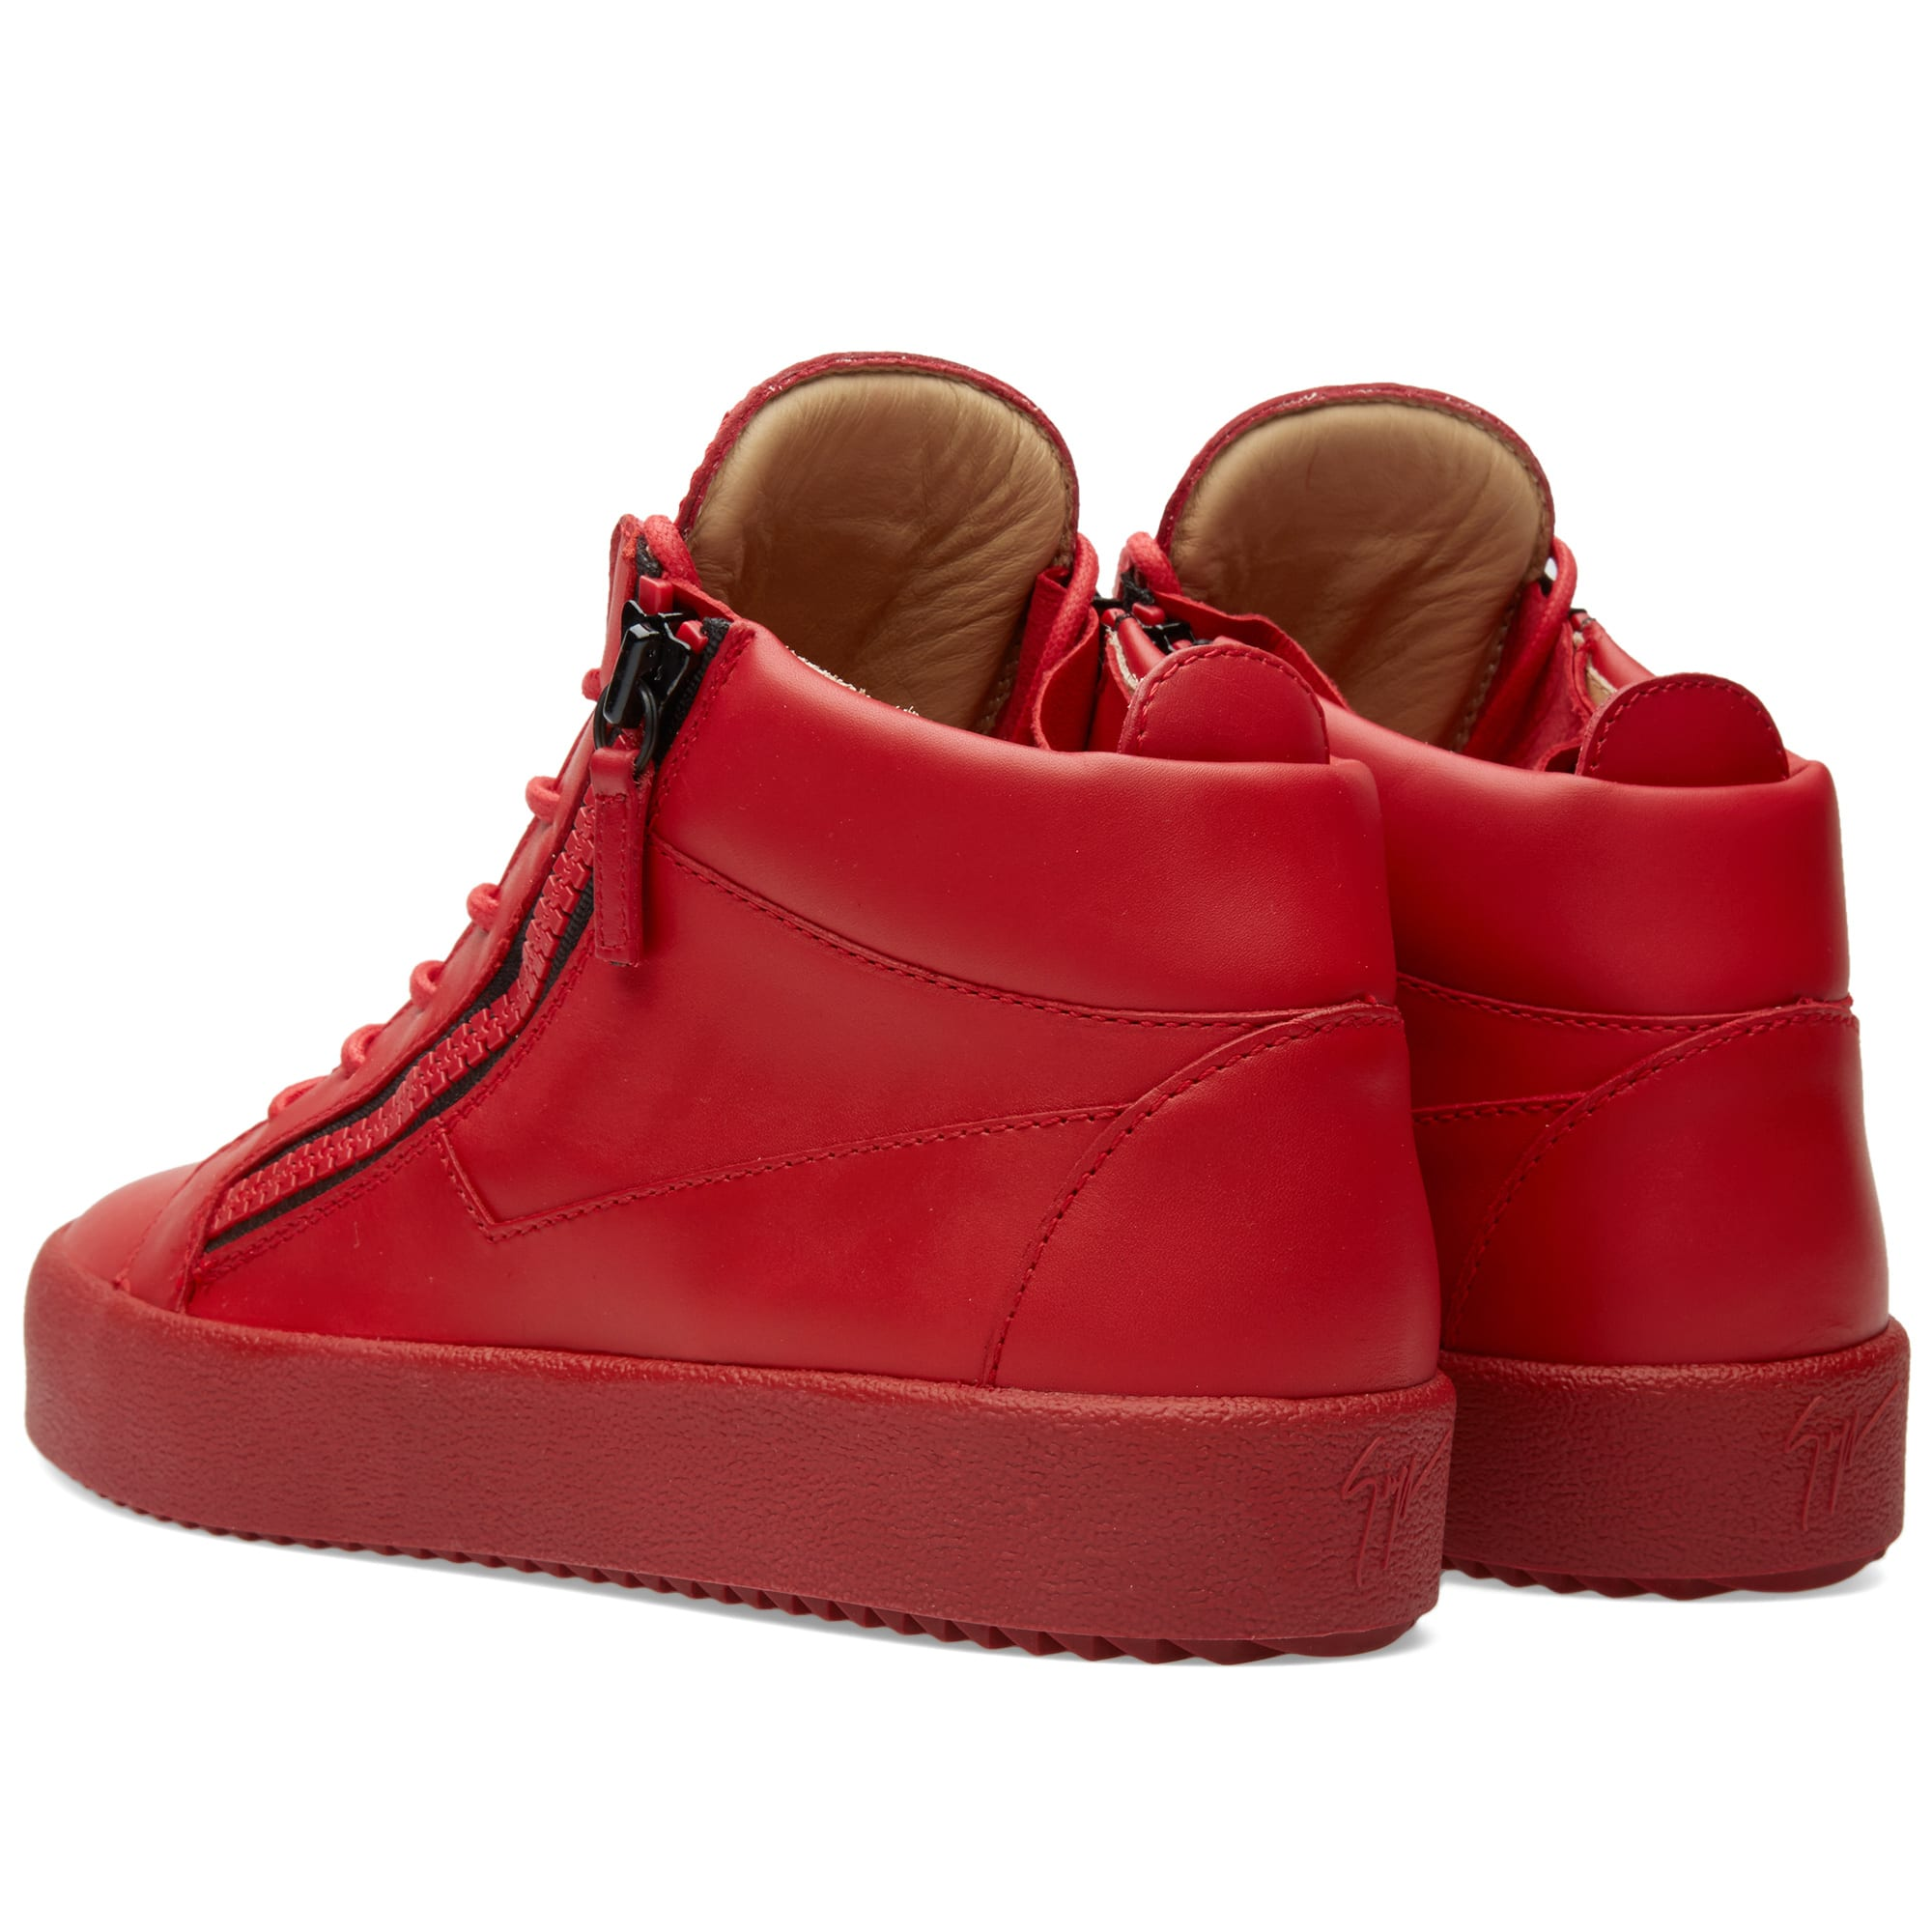 279503cd40386 Giuseppe Zanotti Double Zip Mid Sneaker